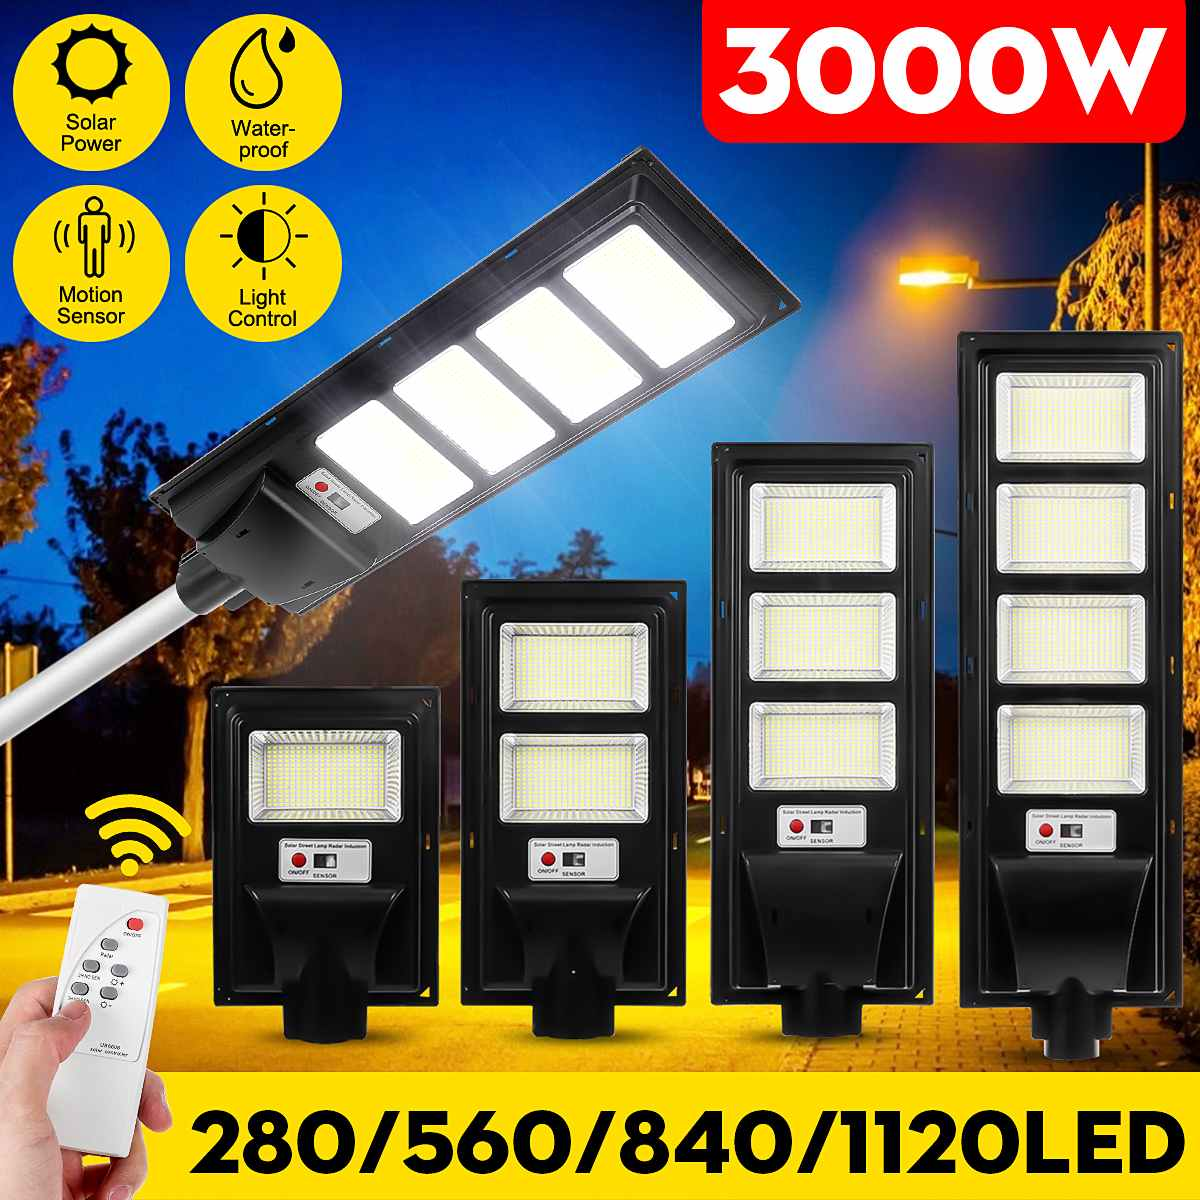 3000W 1120LED Solar Street Wall Light Garden Lamp PIR Motion Sensor w// Remote